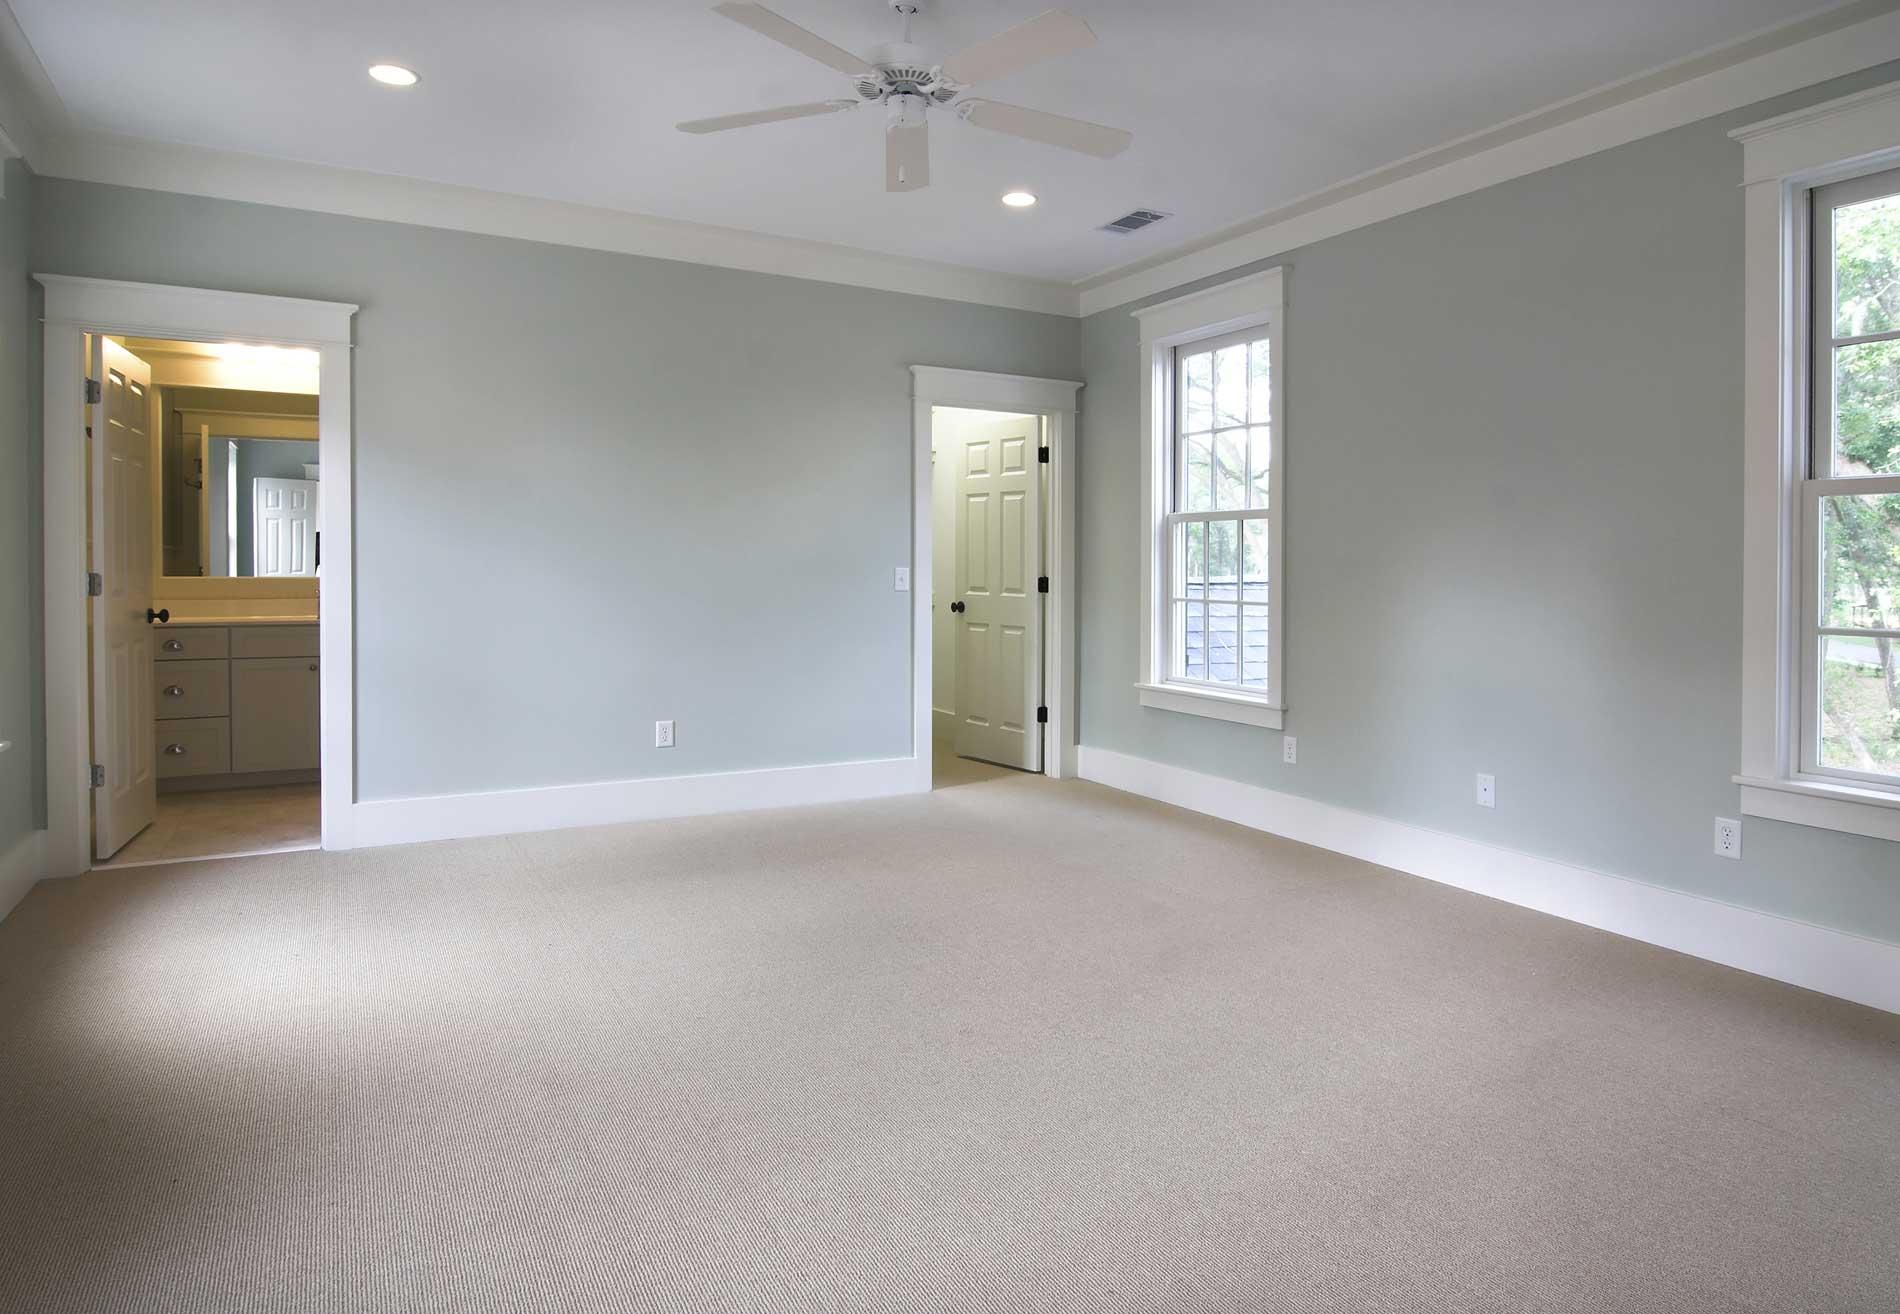 Rental Apartment Shelves Gorgeous Modern Living Room